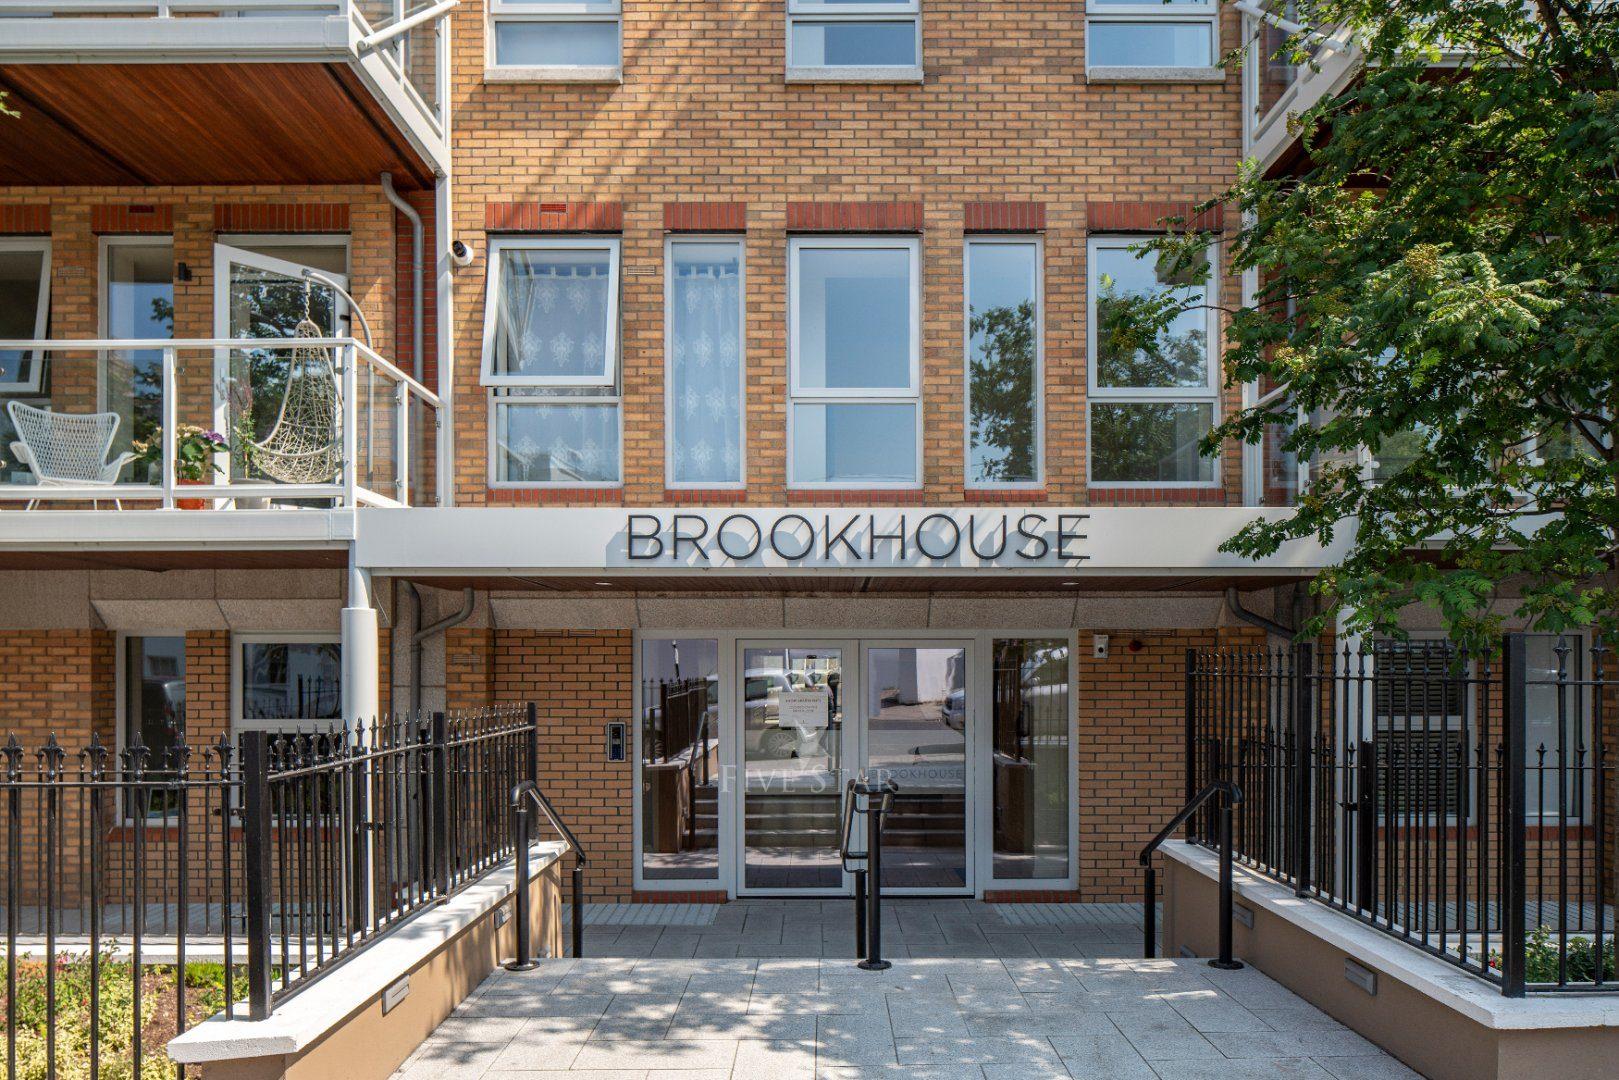 Brookhouse Apartment photo 3